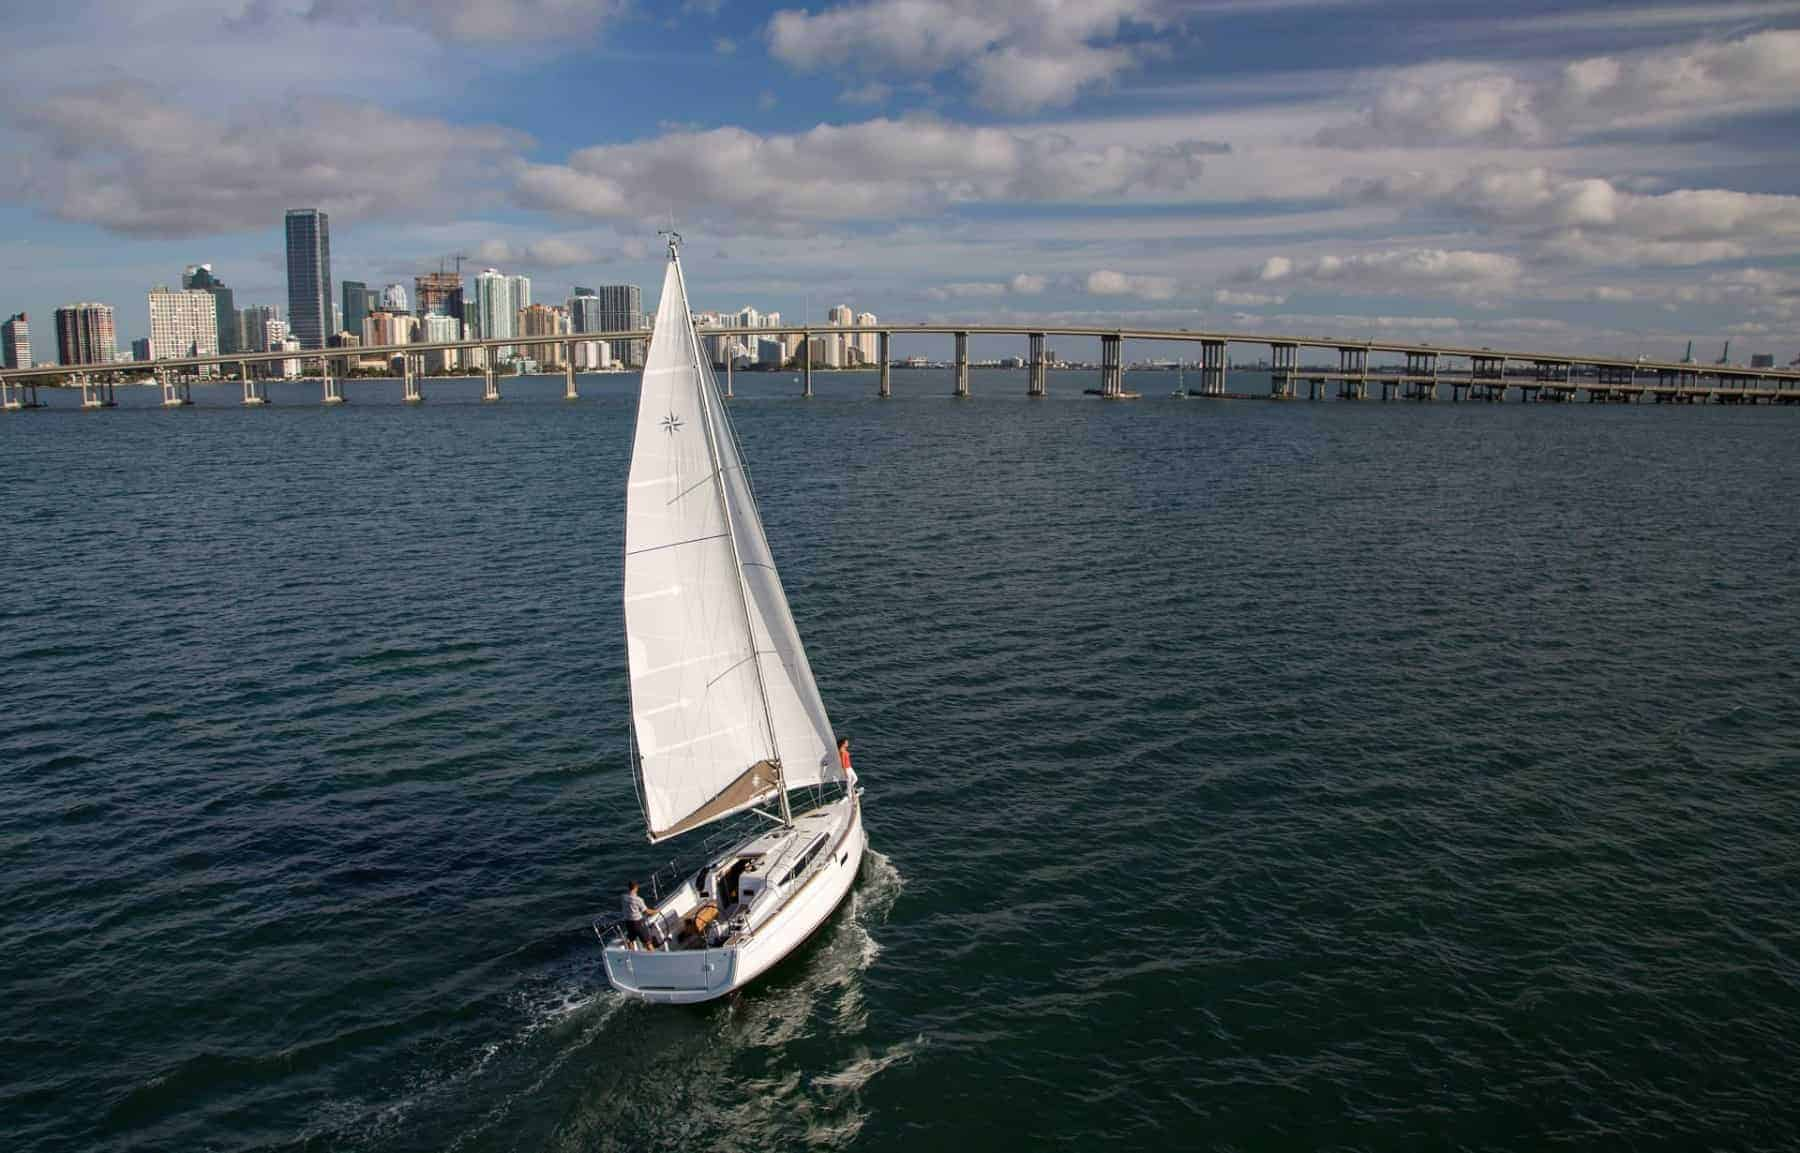 A Jeanneau Sun Odyssey 349 sailing towards a bridge close to a city during a sunny day